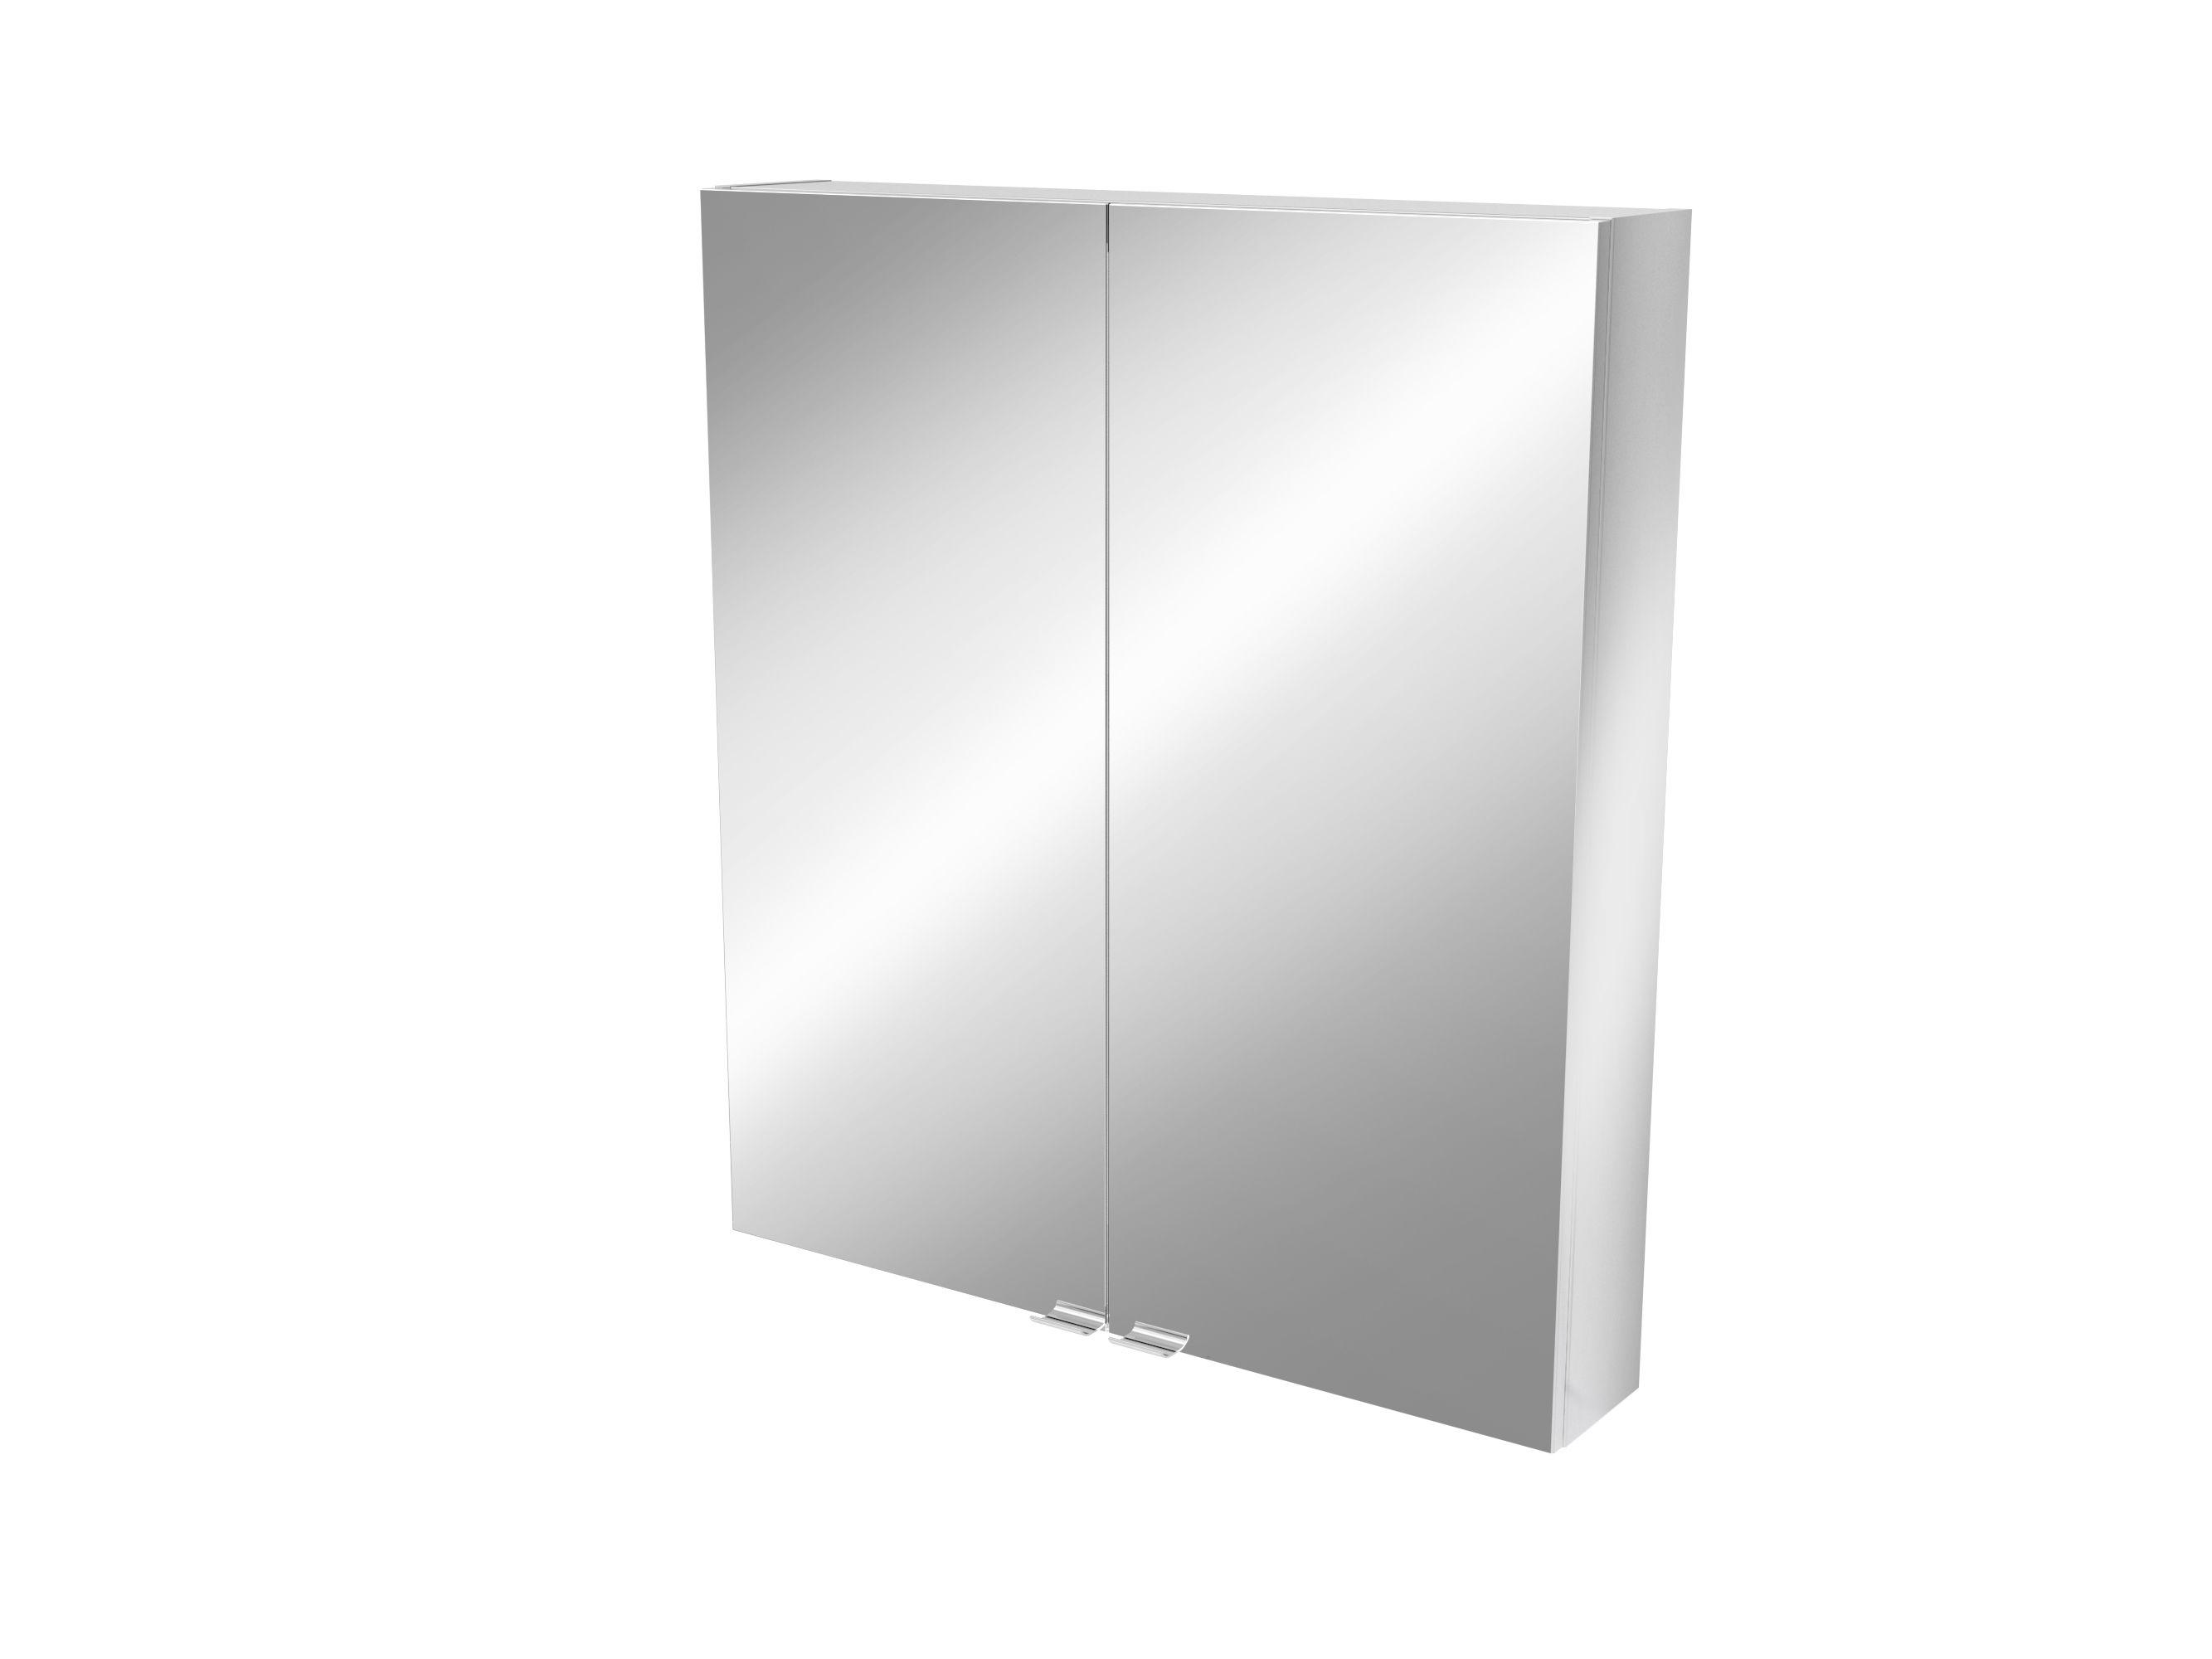 mirrored wall cabinet. Mirrored Wall Cabinet